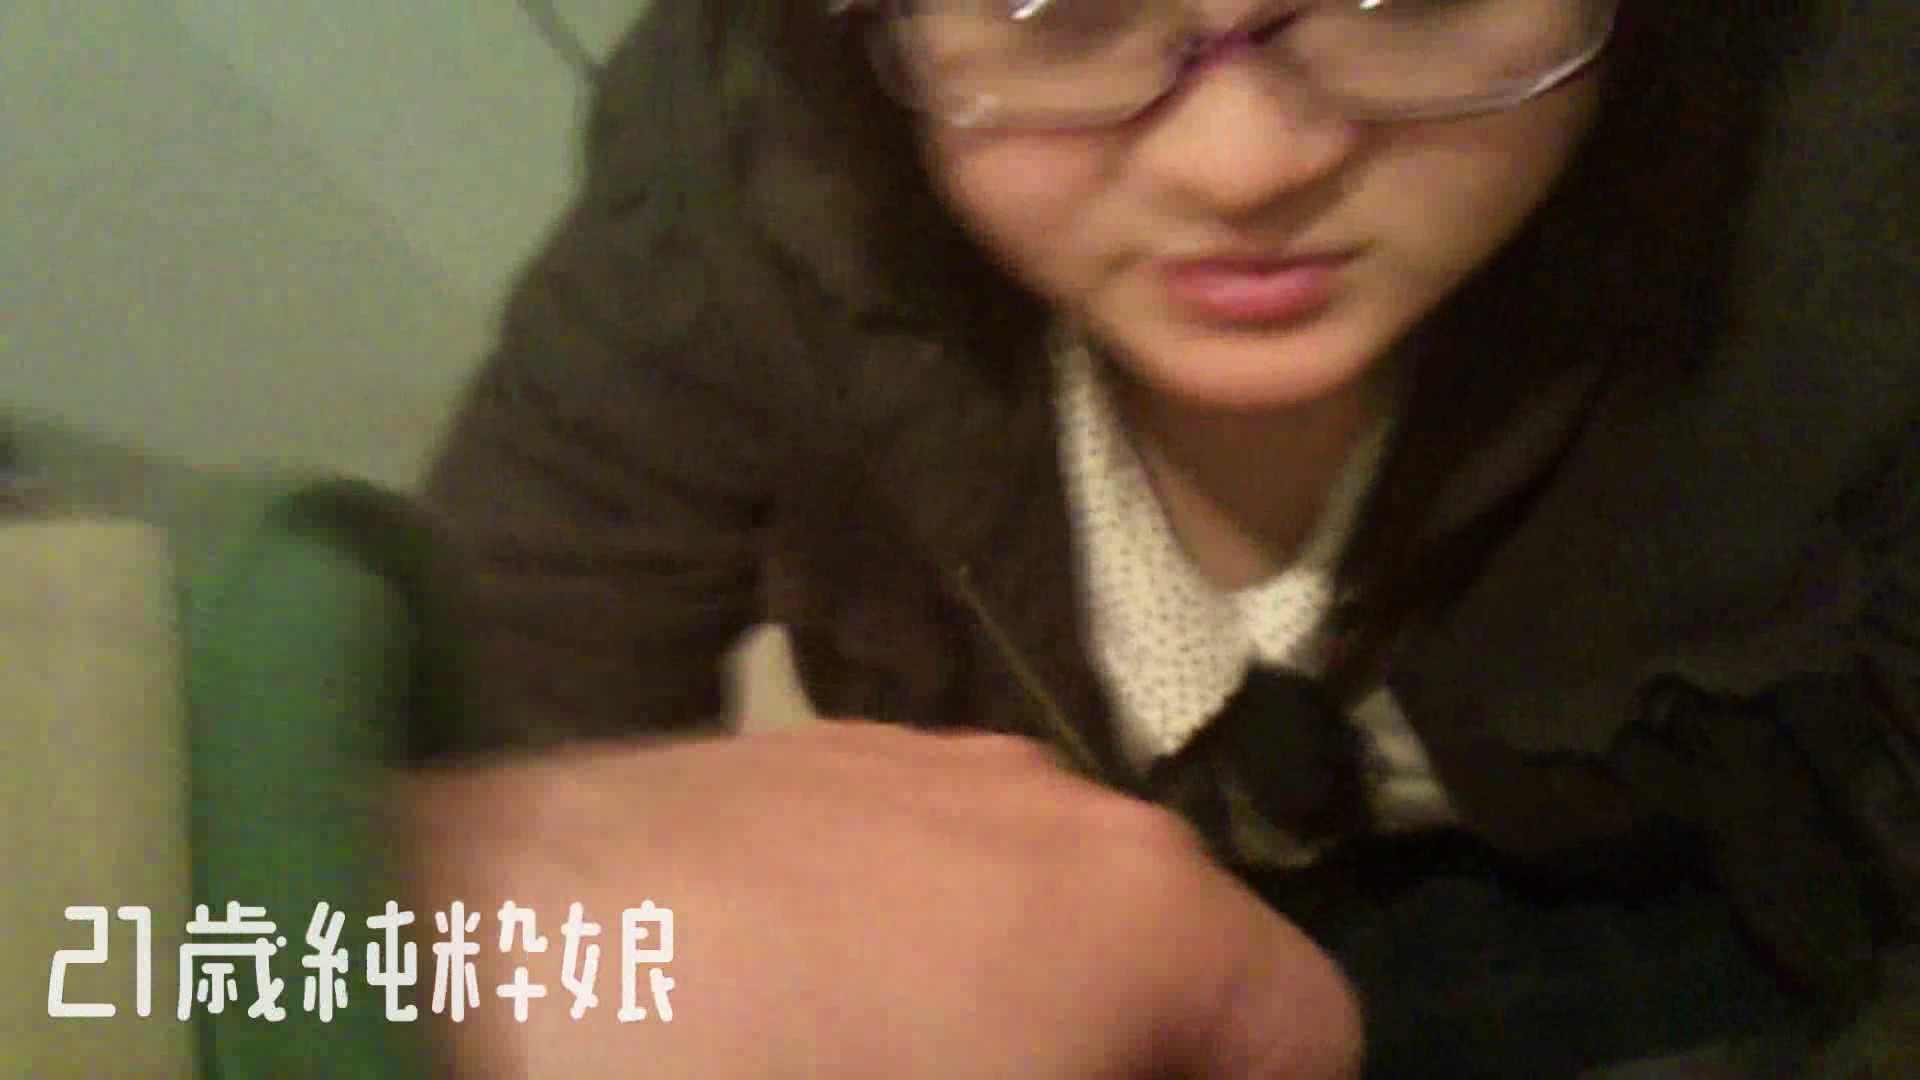 Gカップ21歳純粋嬢第2弾Vol.5 OLヌード天国  110PIX 32